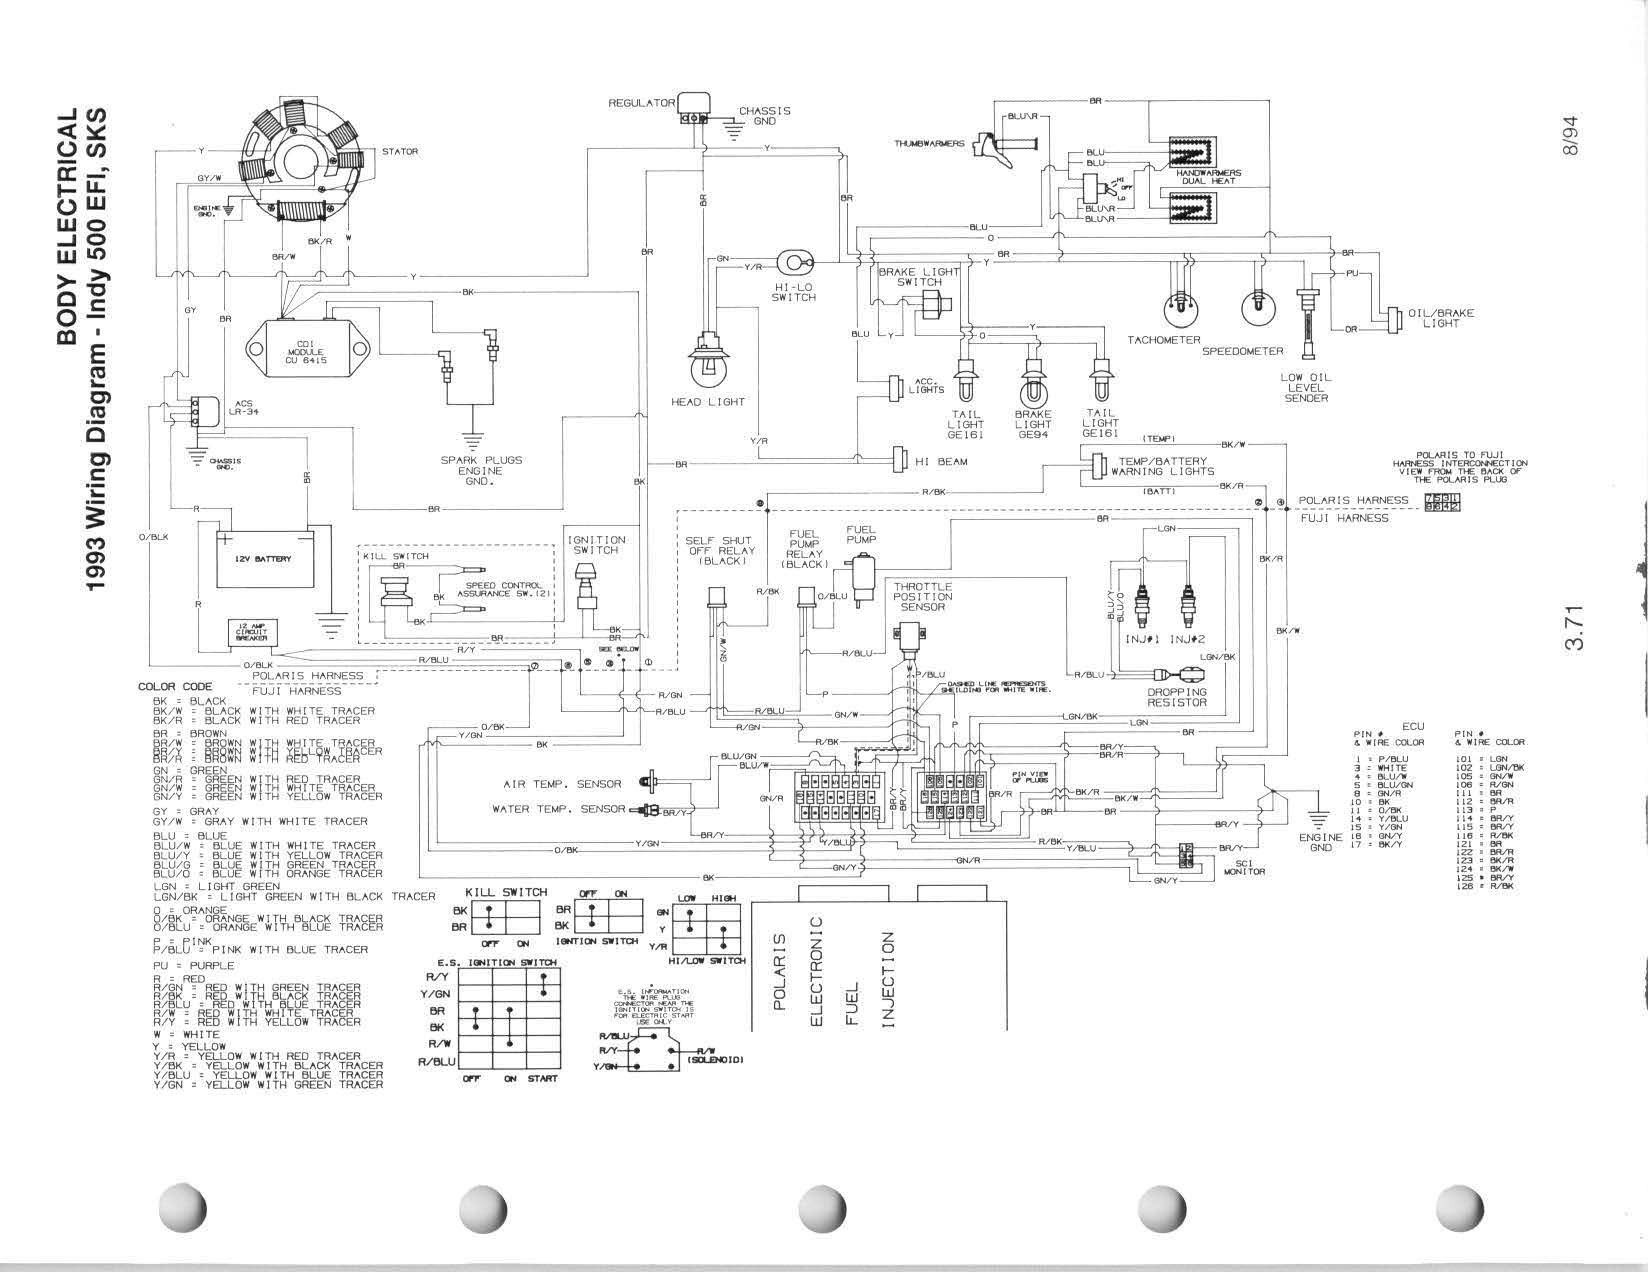 polaris wiring diagram needed   Snowmobile FanaticsSnowmobile Fanatics